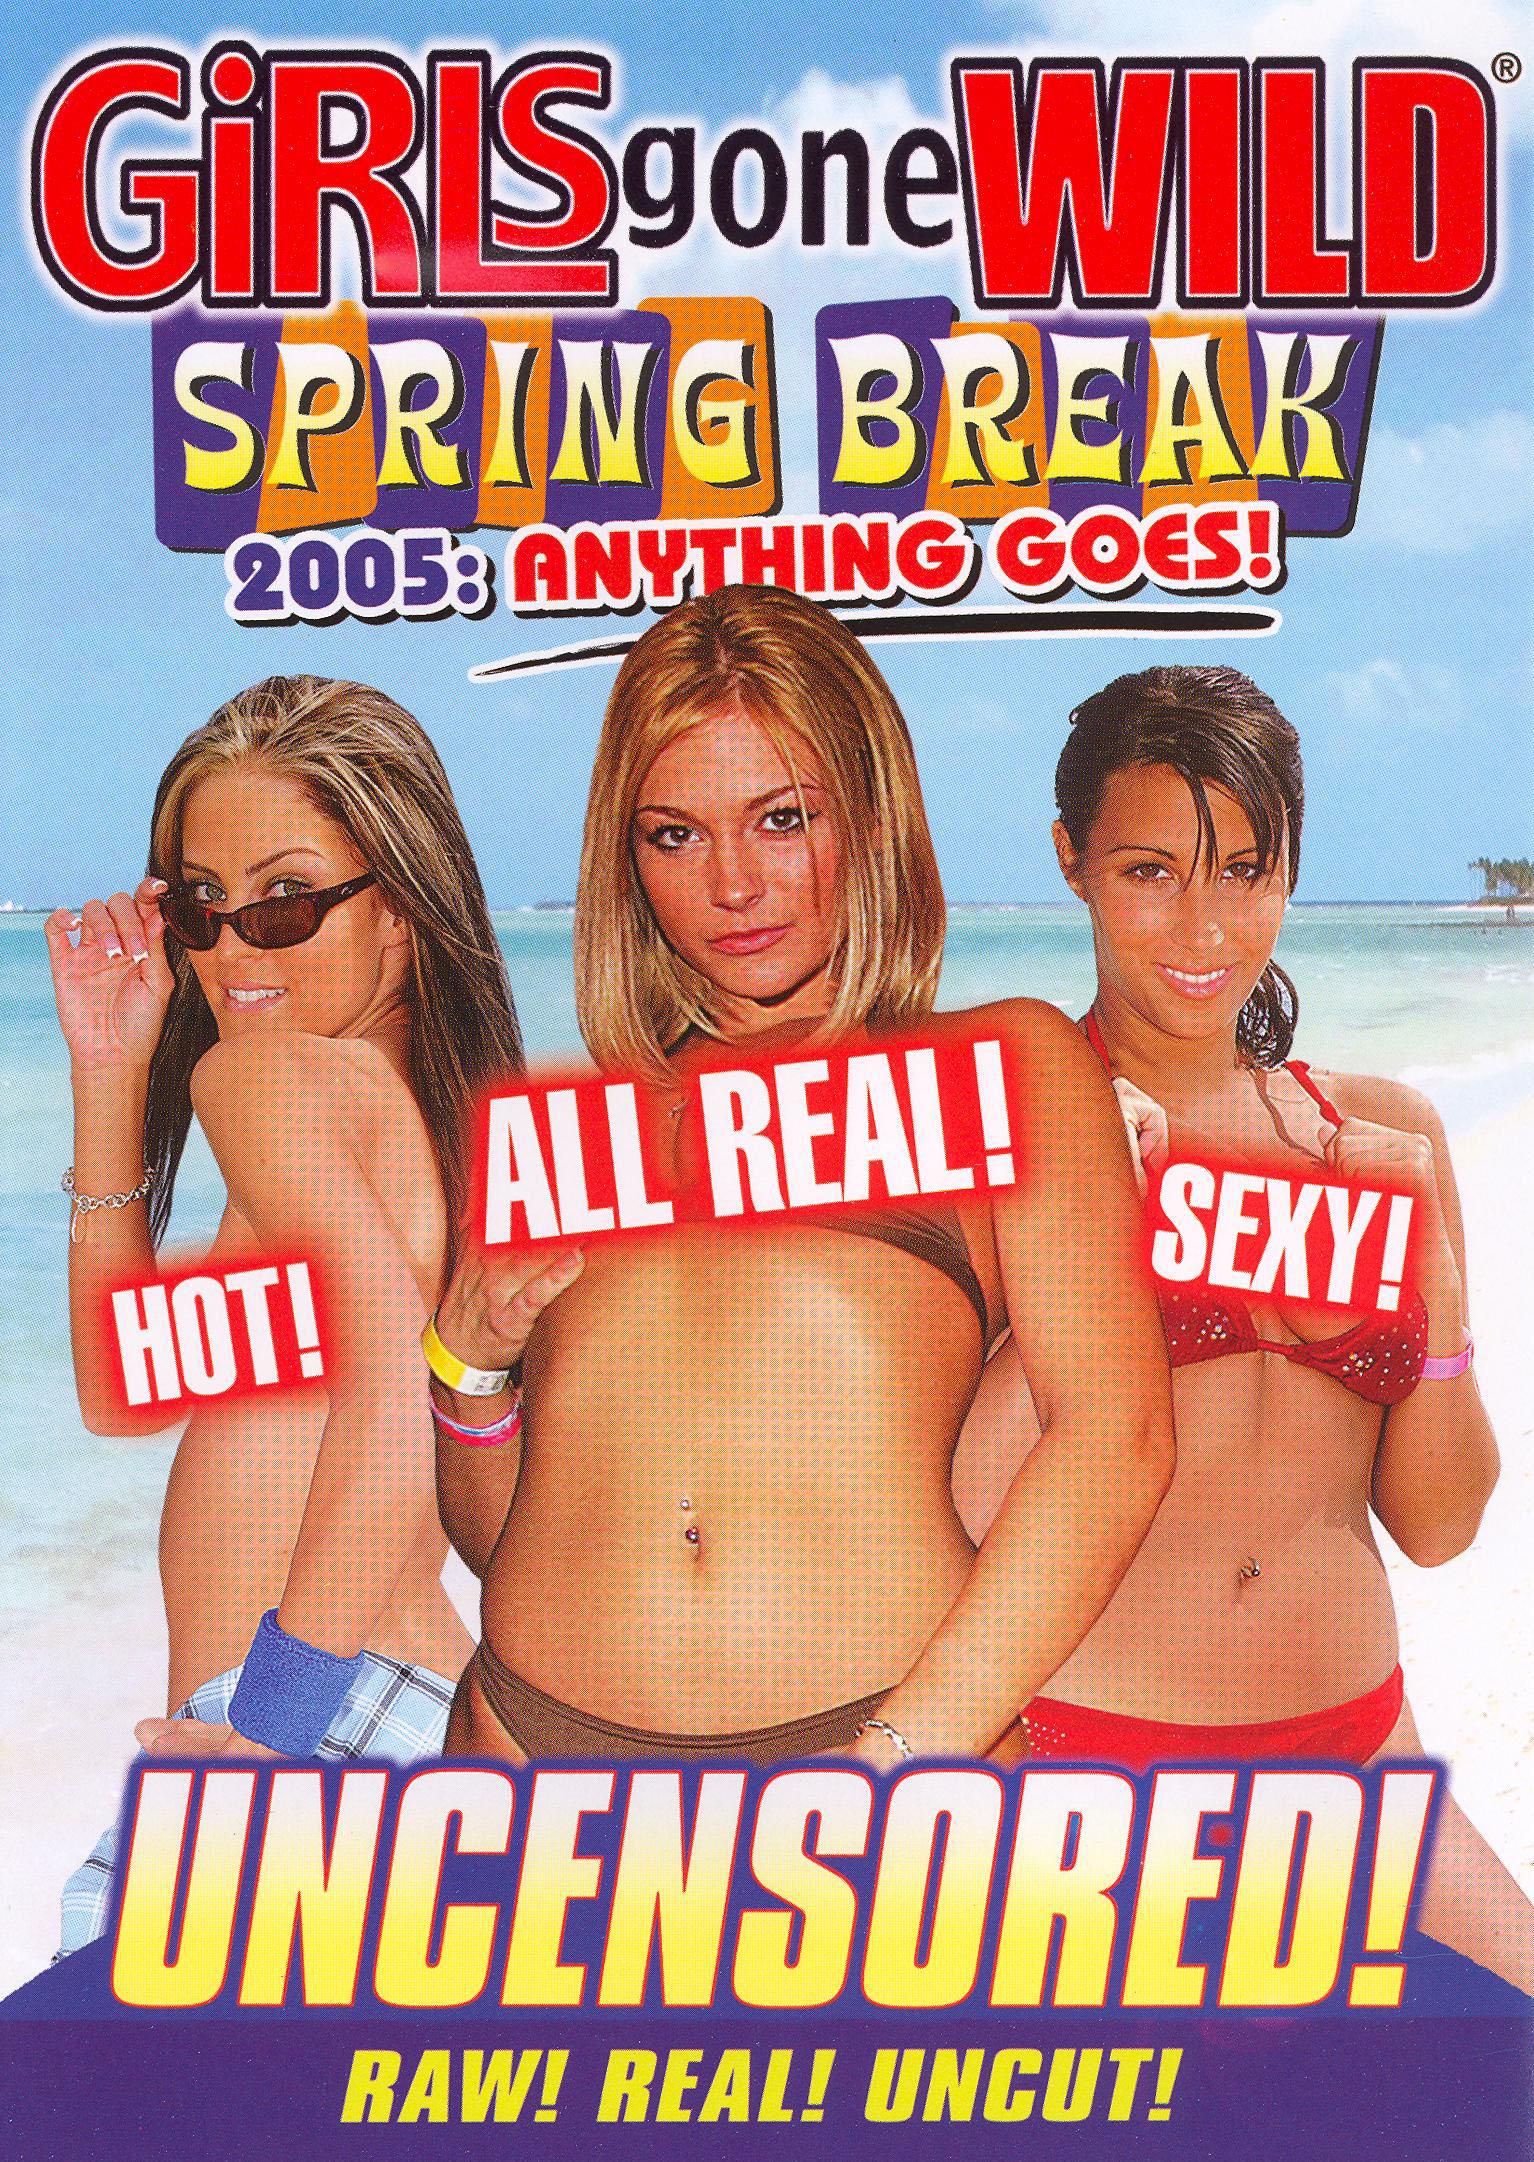 Girls Gone Wild: Spring Break 2005 - Anything Goes